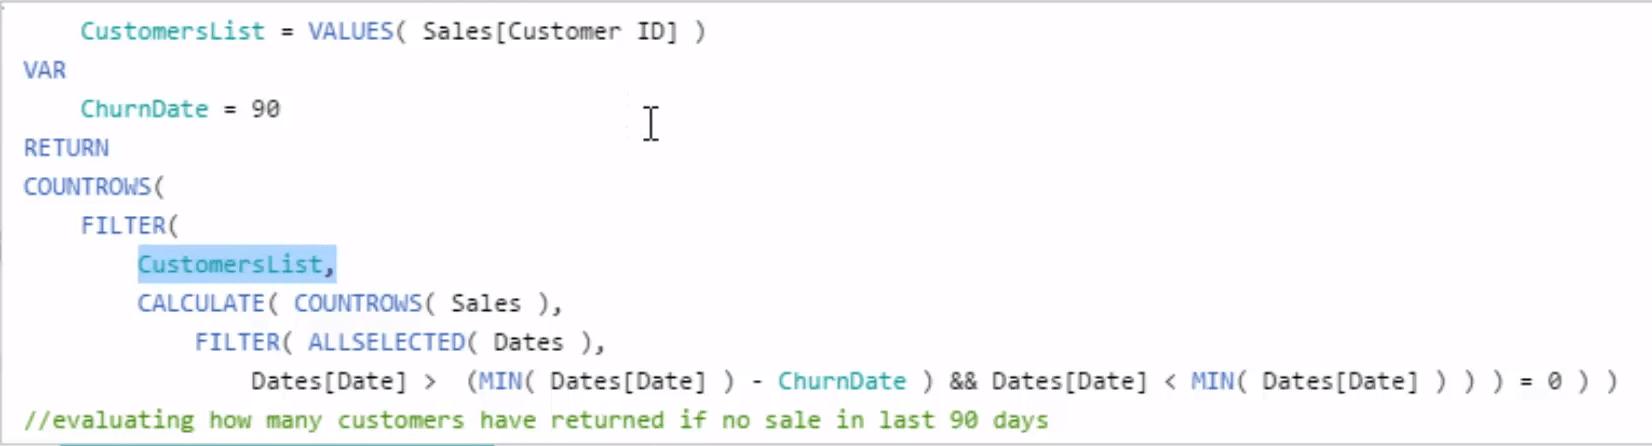 Returning Customers formula in Power BI using DAX